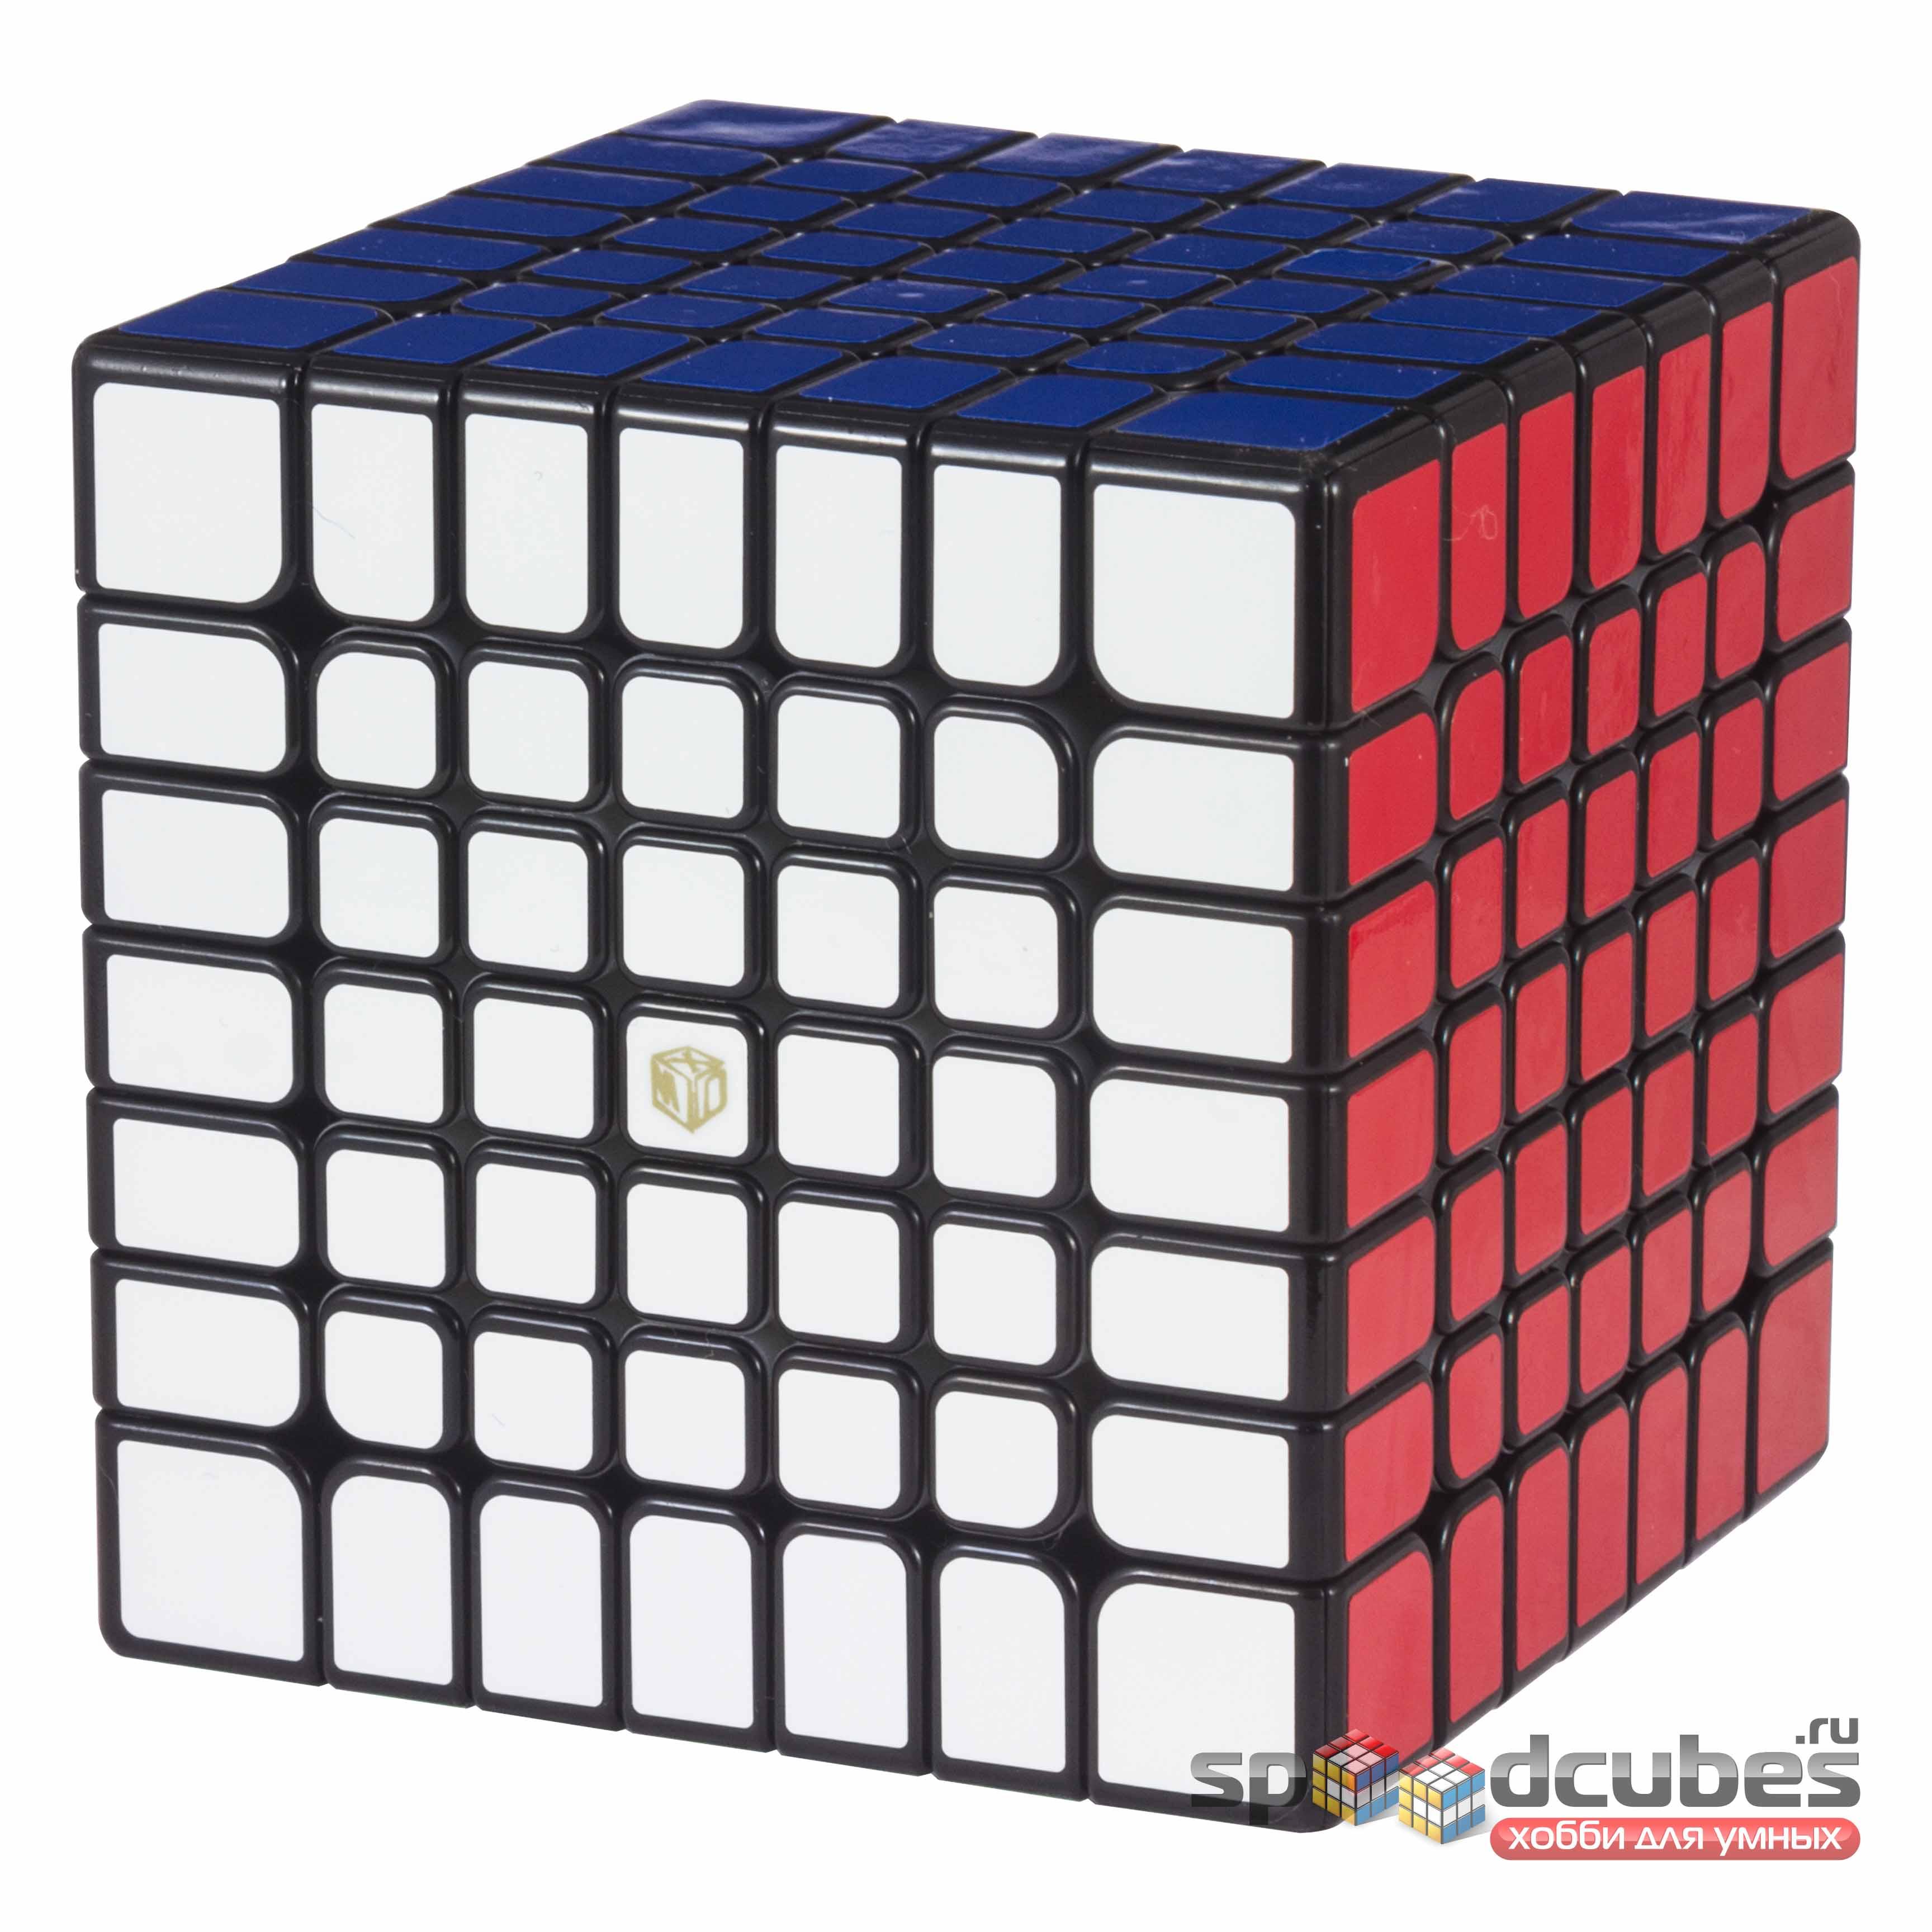 QiYi (MoFangGe) 7x7x7 Spark M Black 2